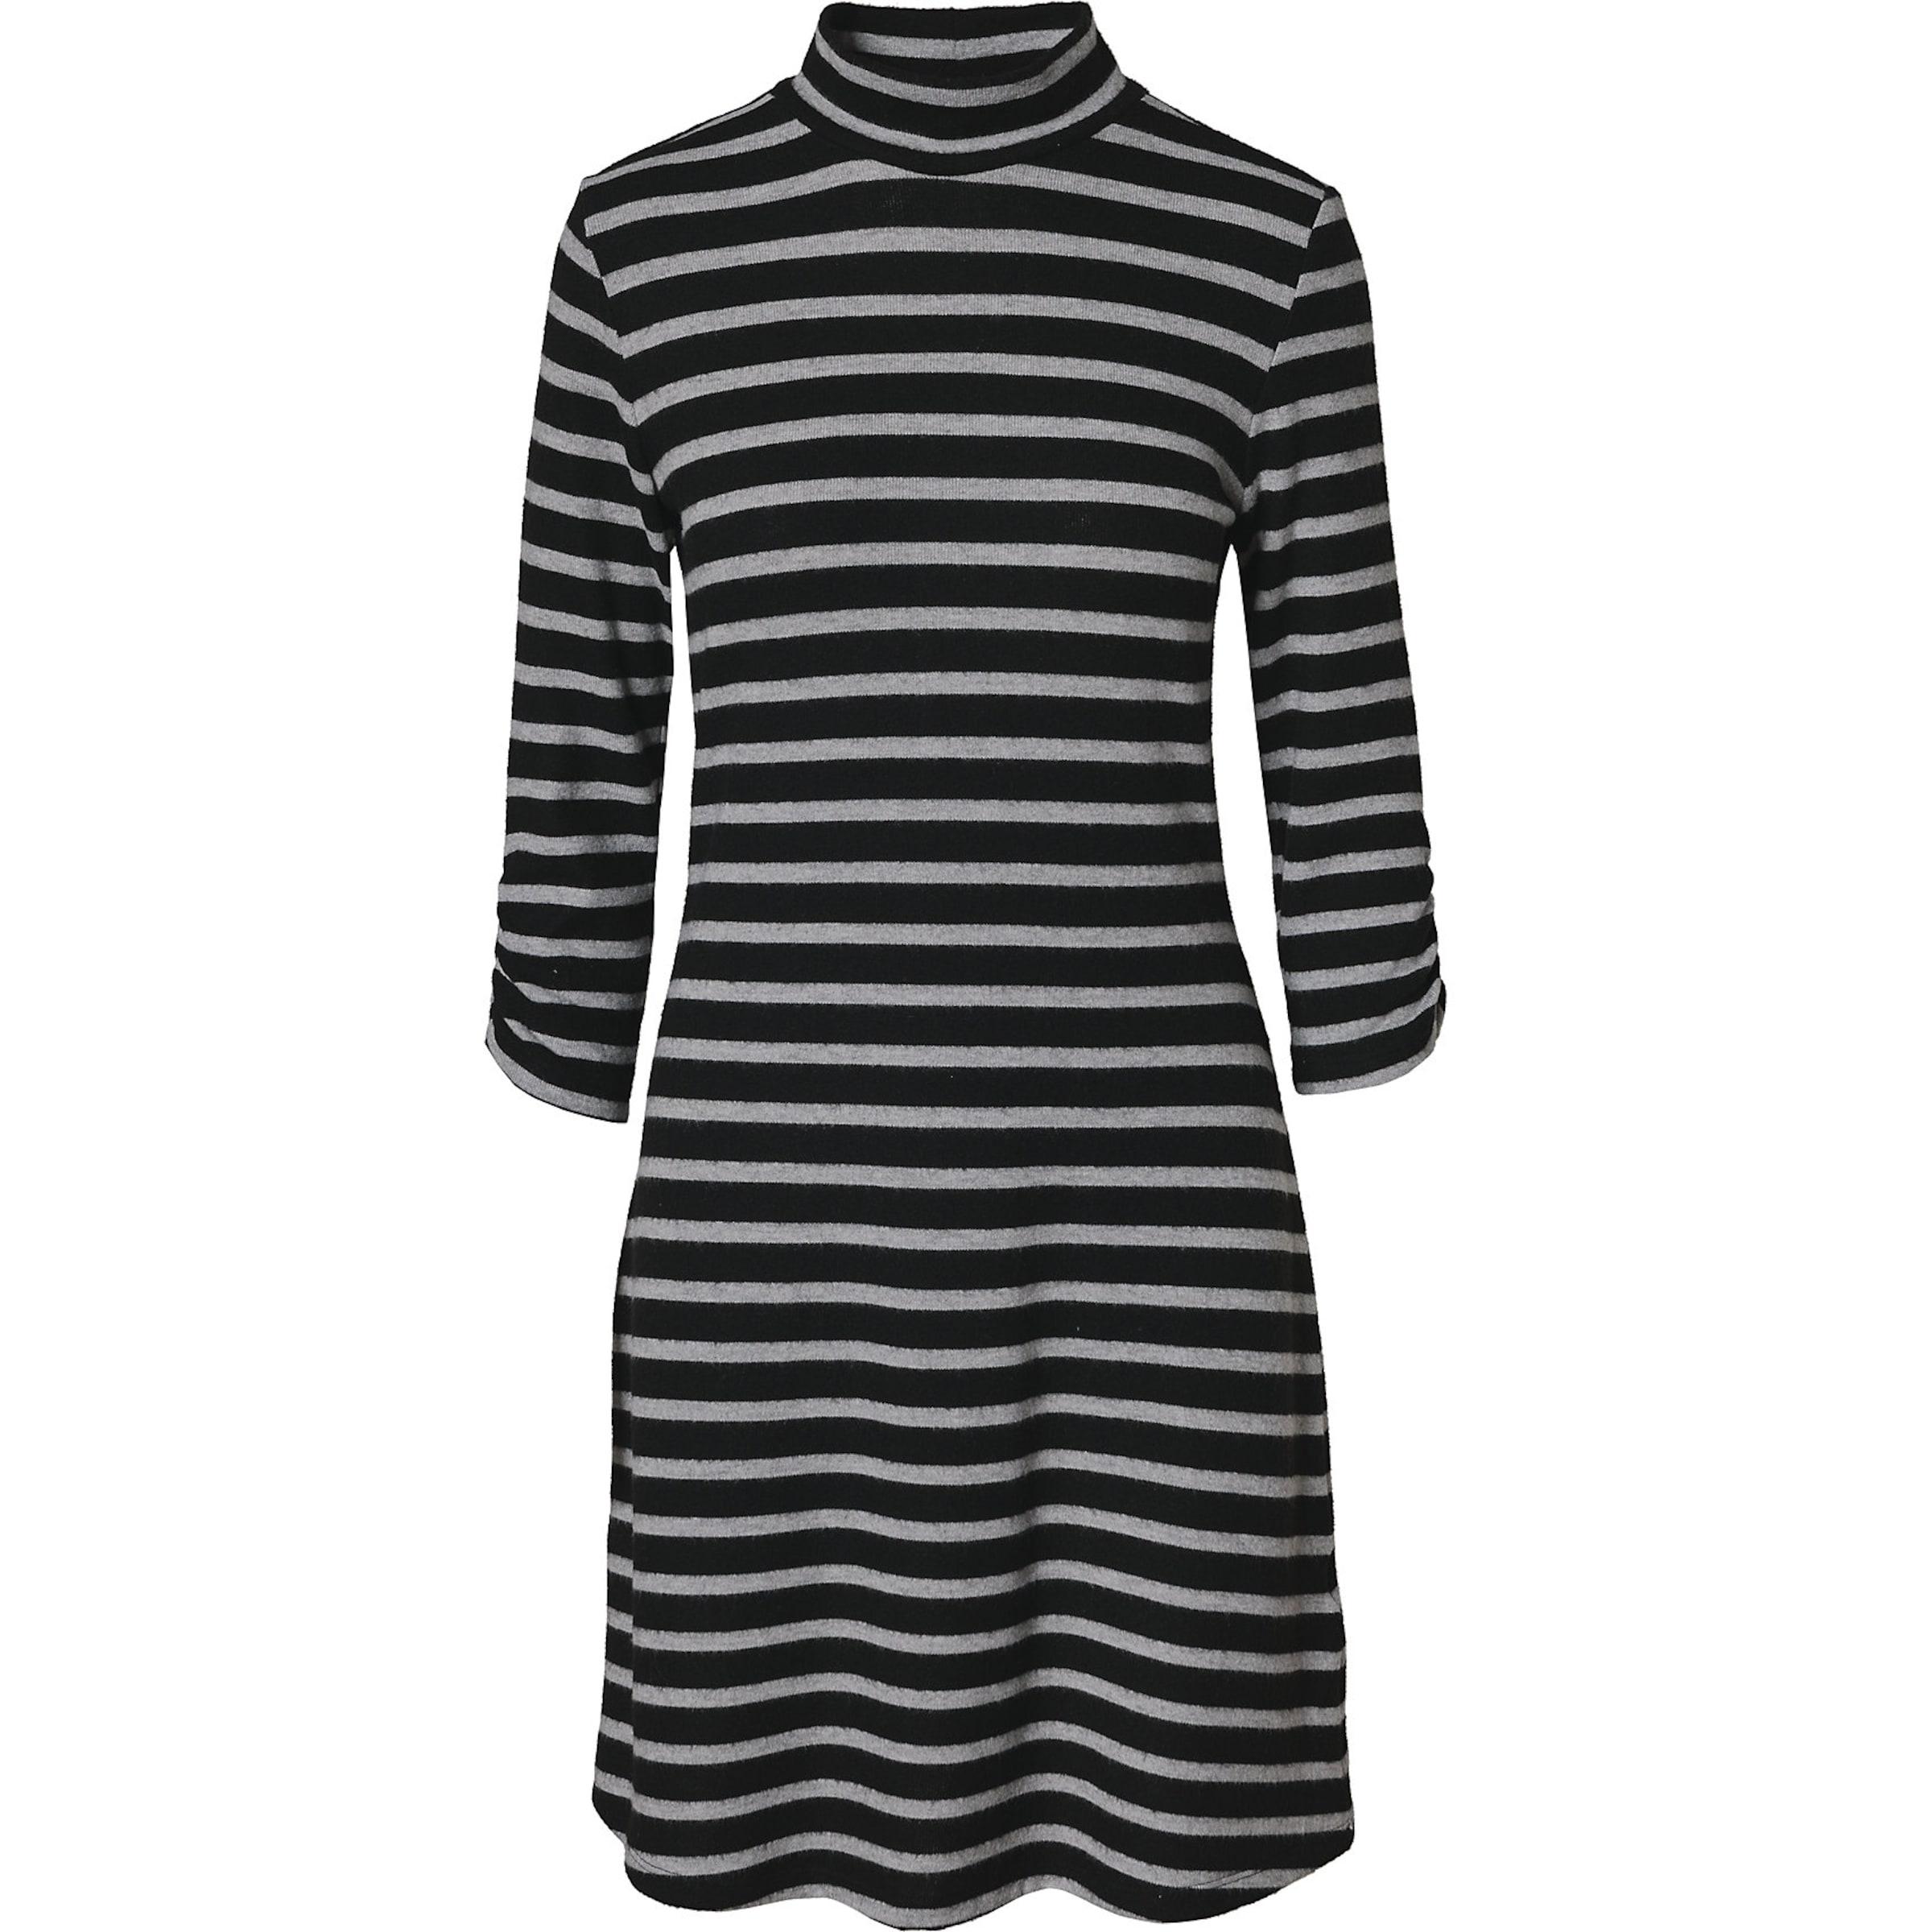 Esprit Edc By In DunkelgrauSchwarz Kleid 2HEDbeW9IY